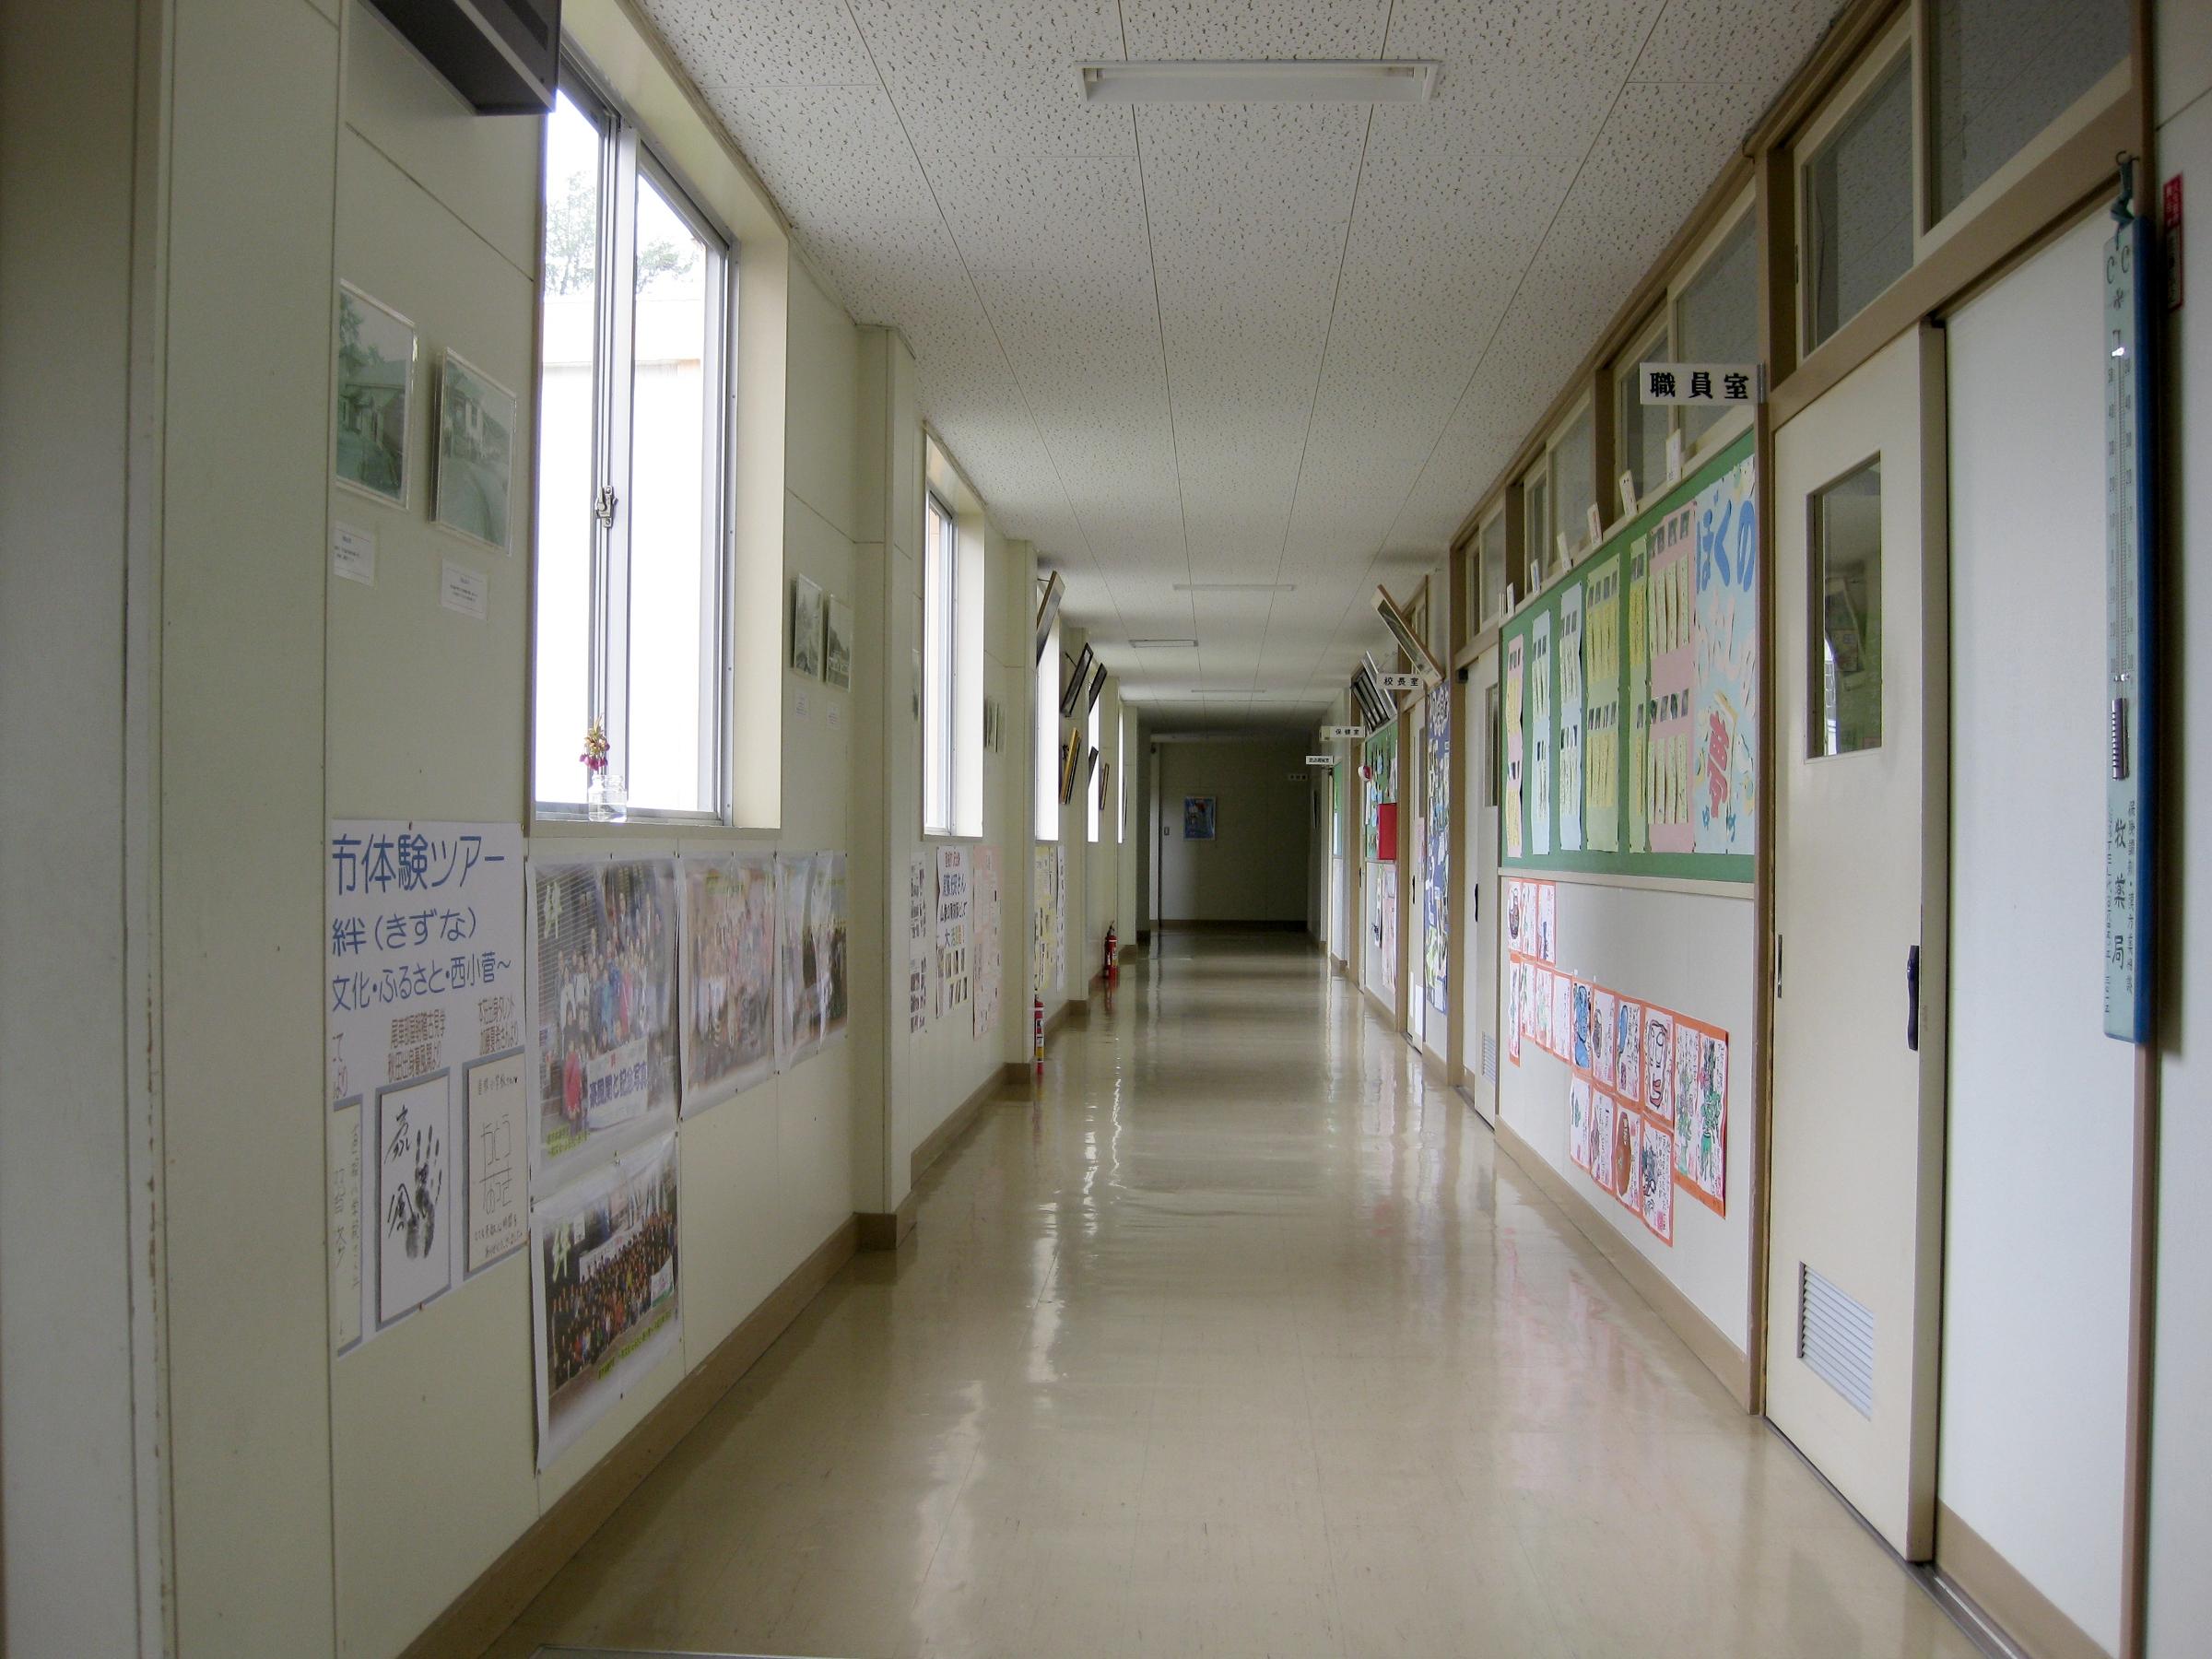 Back To School 101 Navigating The Hallway